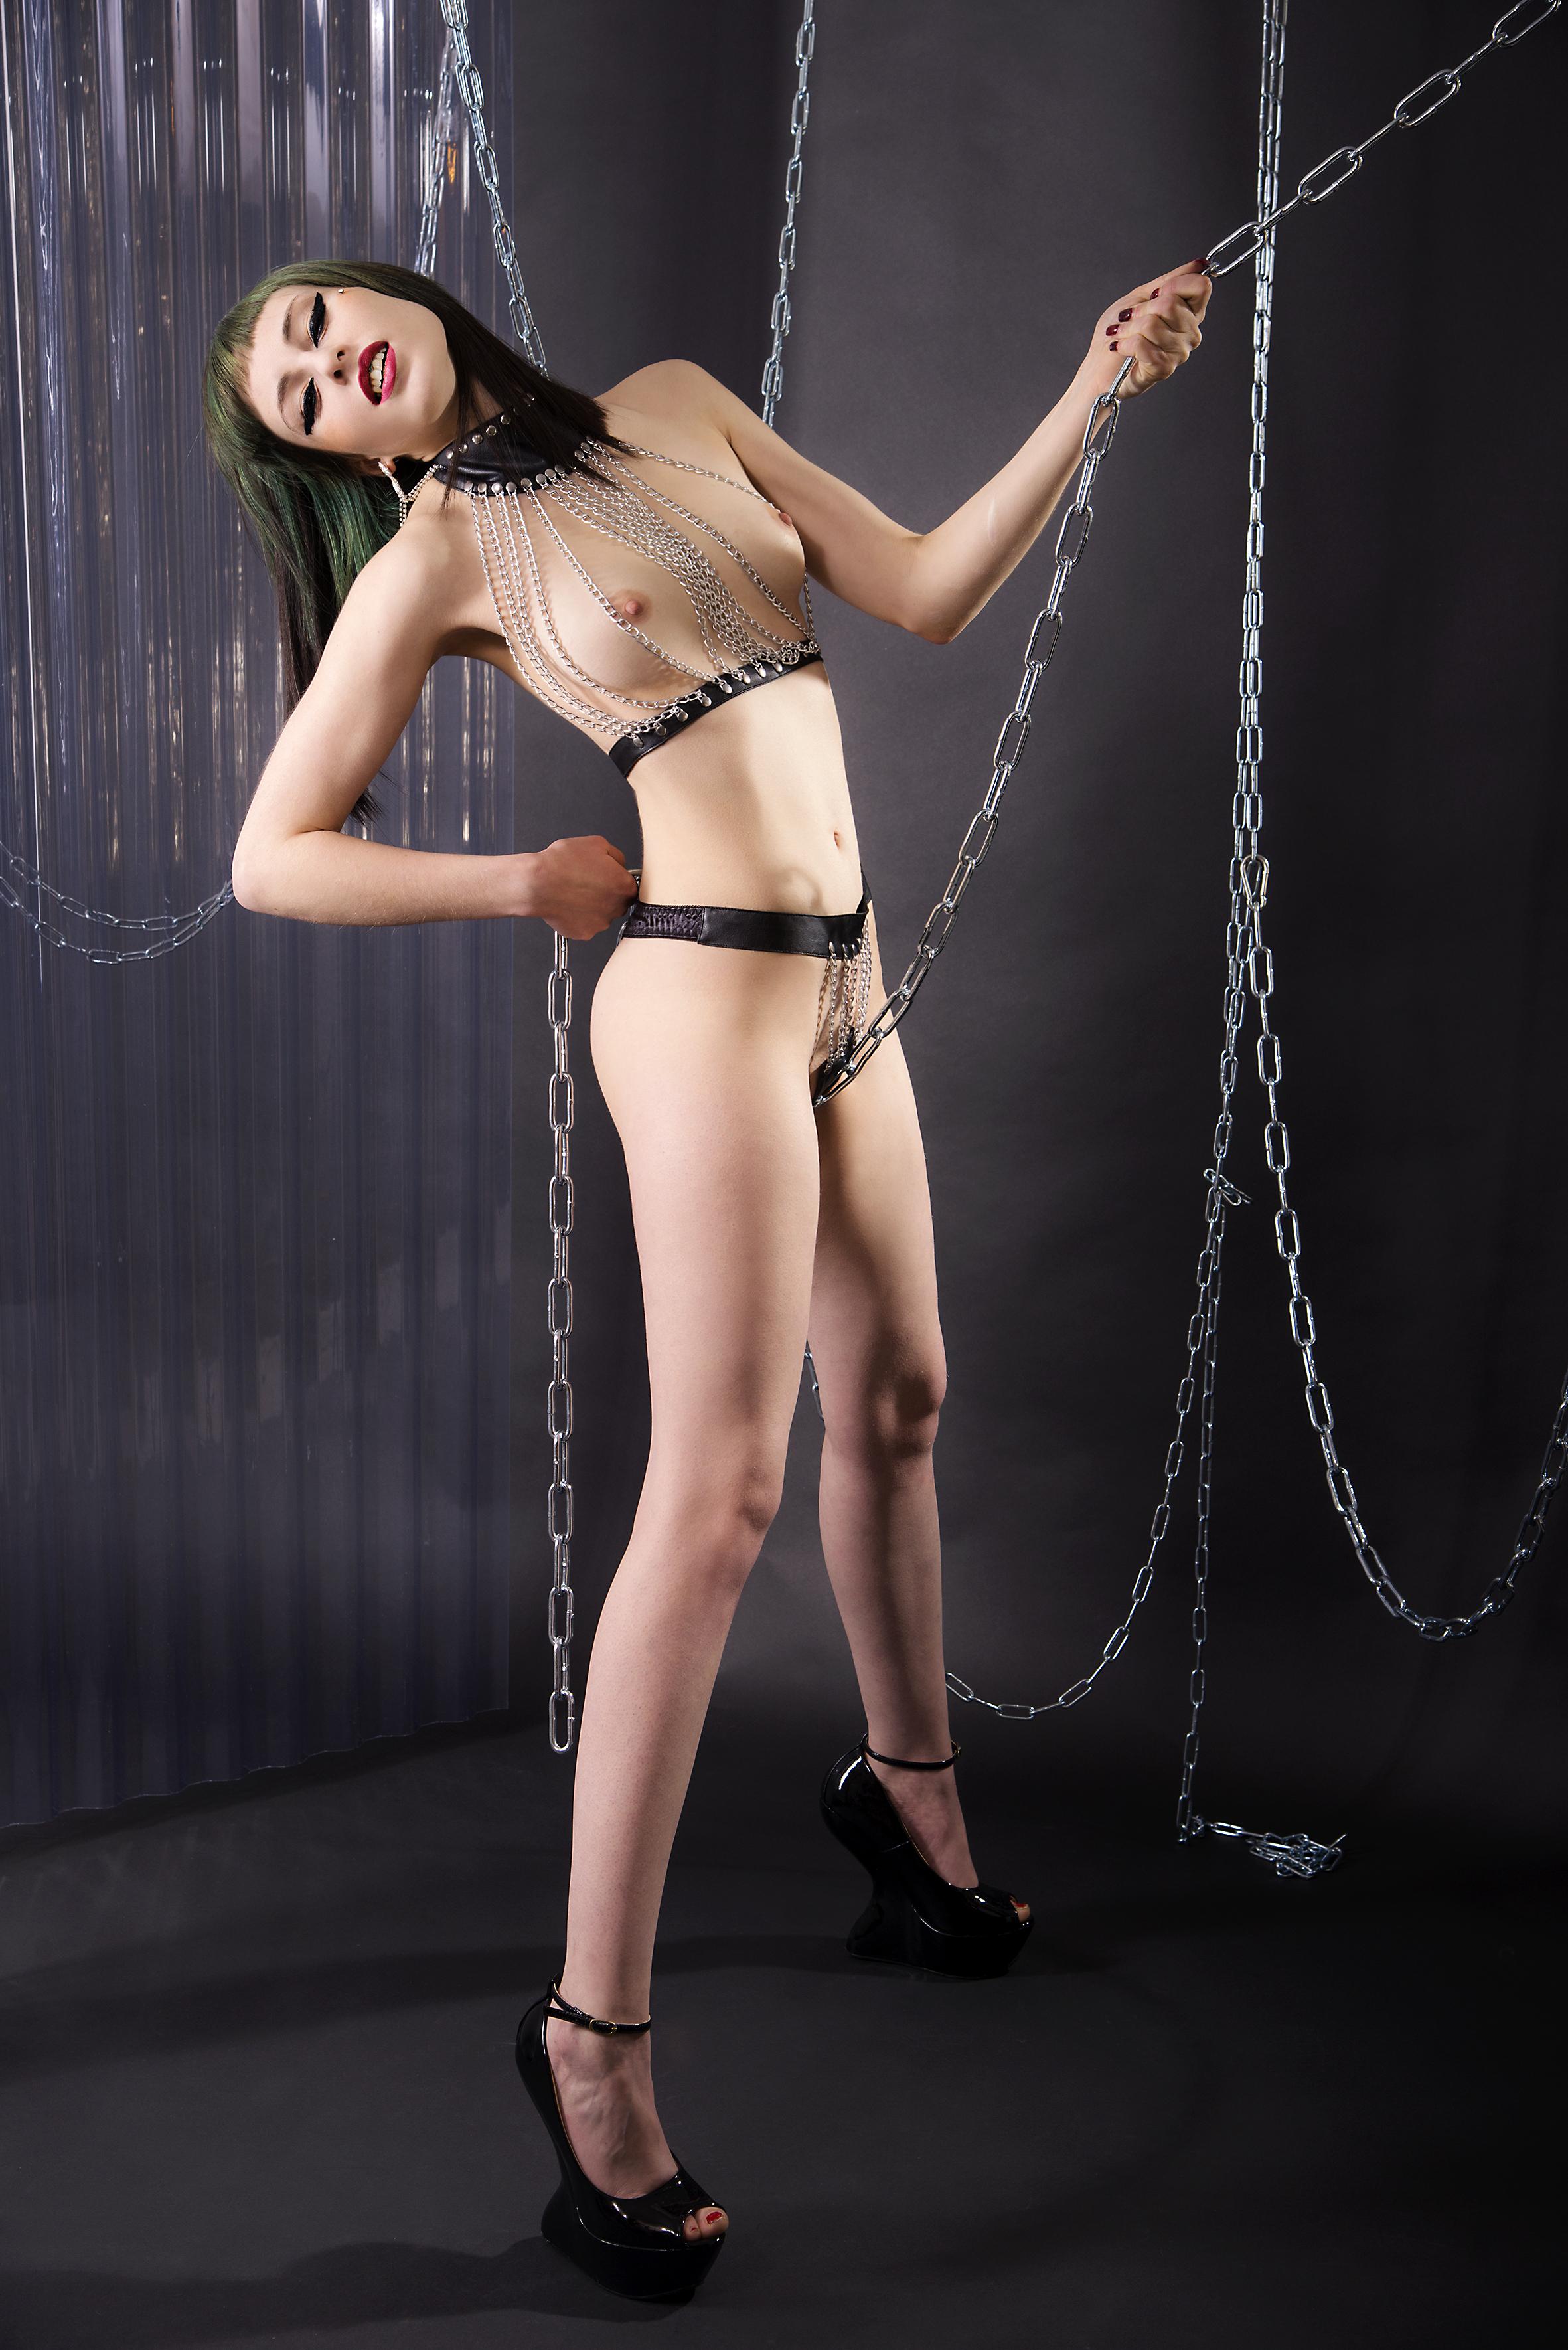 Switcherin Lidia-Roxanne - Bild 8